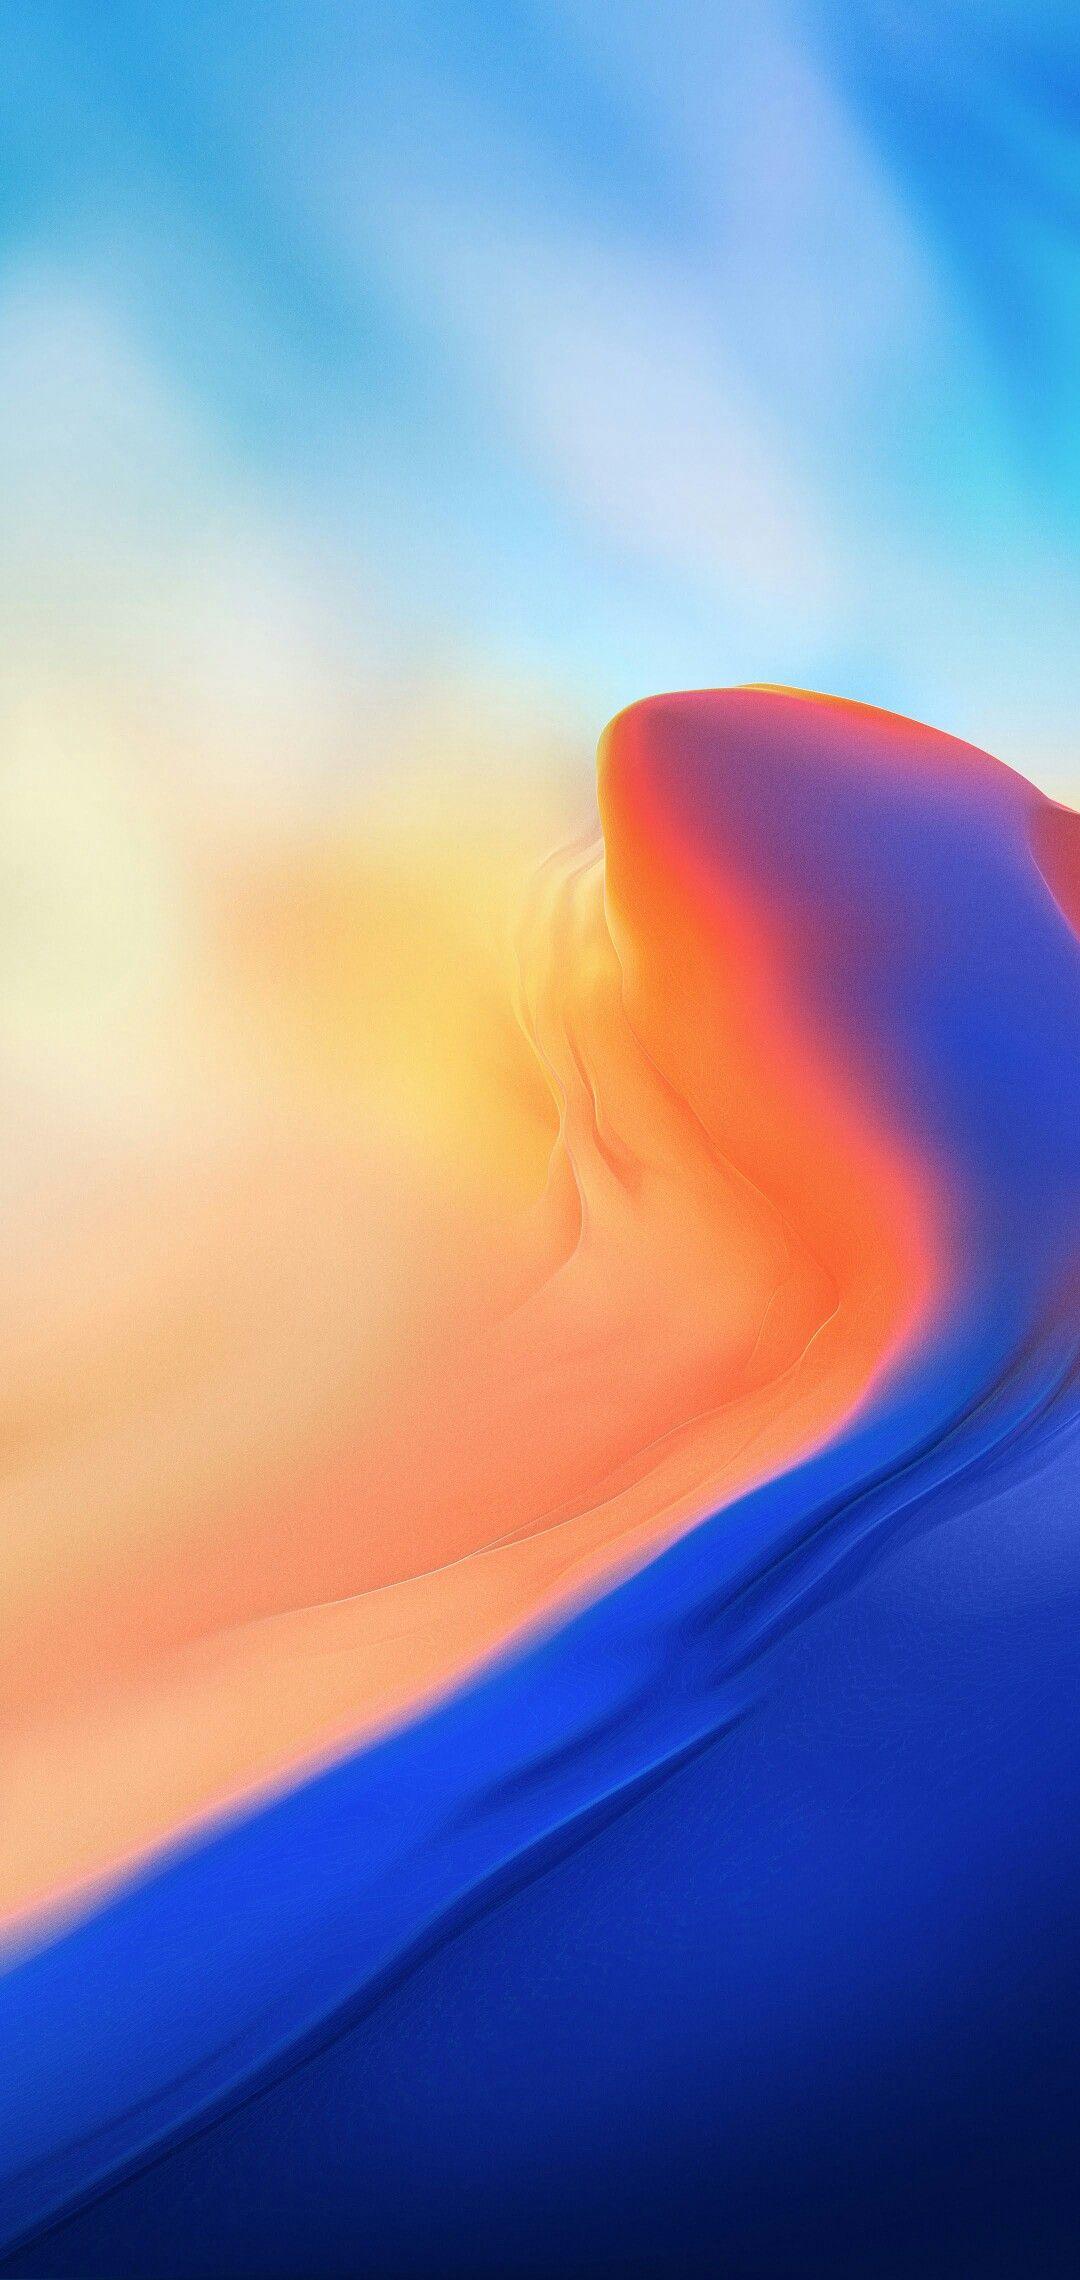 Pin By Iyan Sofyan On Abstract Amoled Liquid Gradient Apple